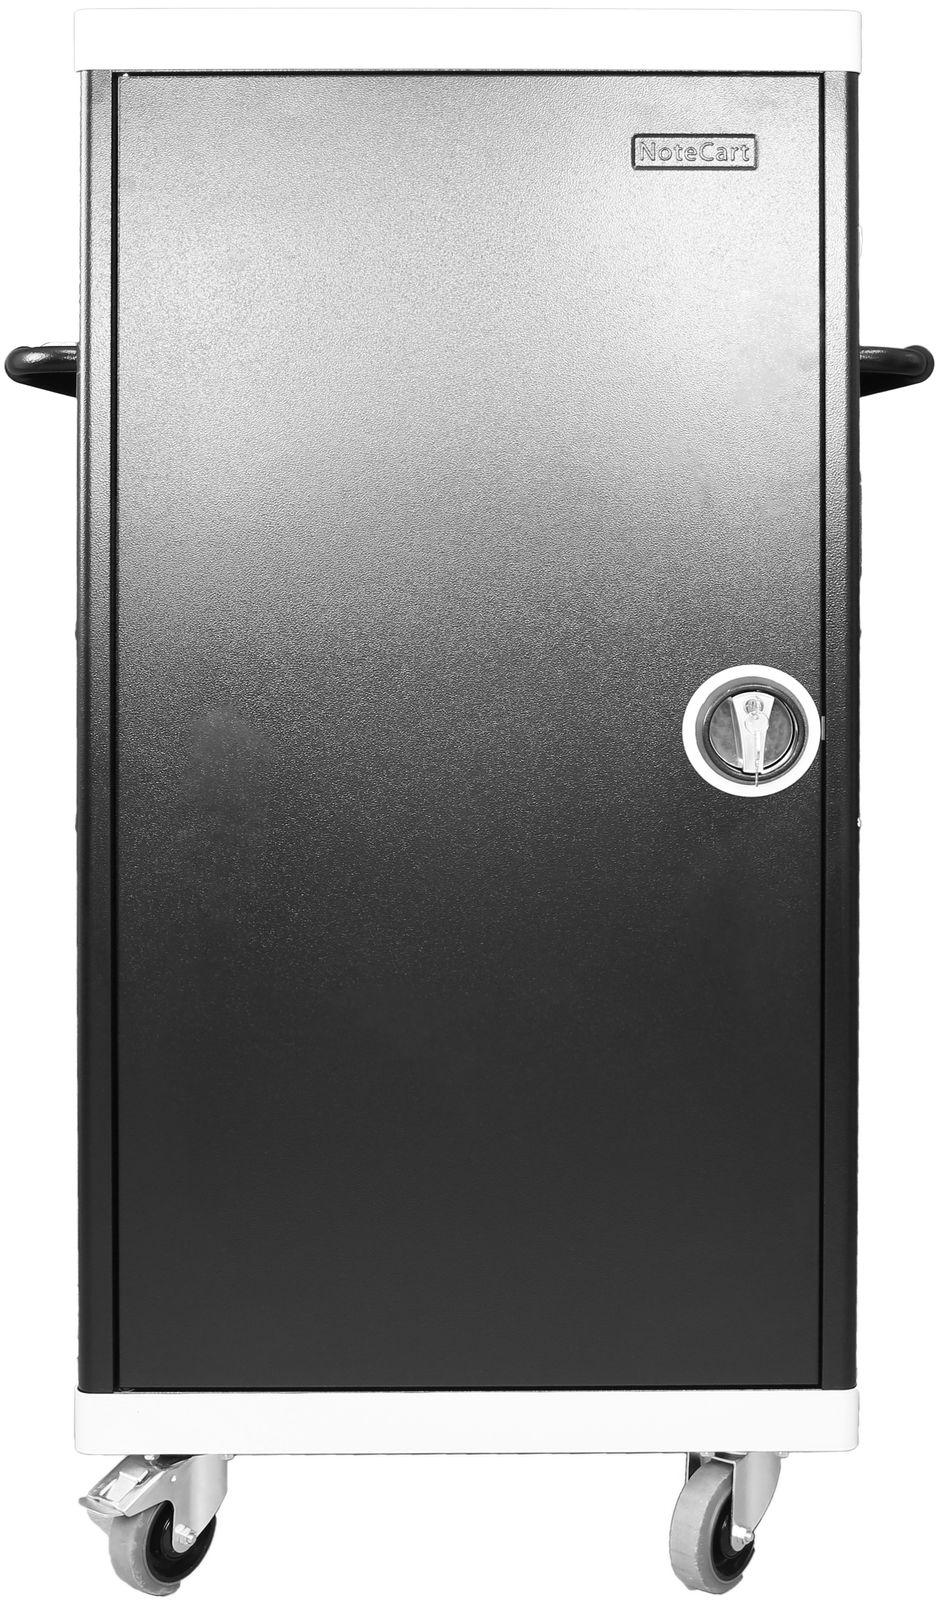 Leba NoteCart Unifit for 32 Tablets Fix shelv. 32 SC power sockets NCU-32T-FH-419-SC - eet01